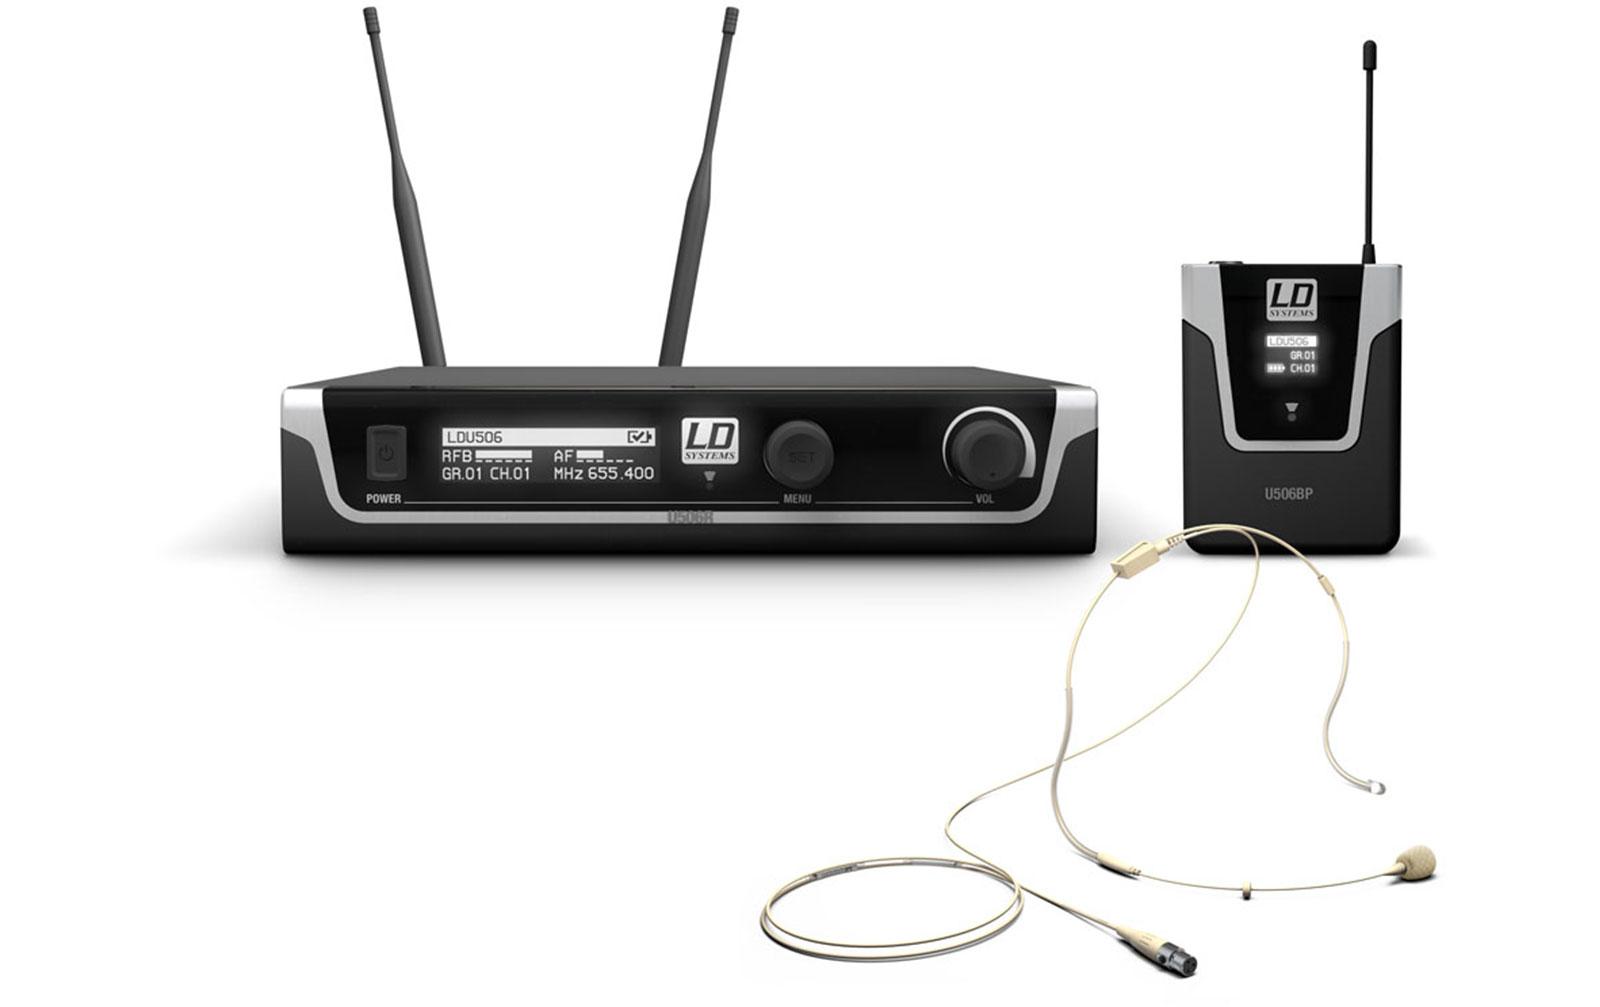 ld-systems-u506-bphh-funkmikrofon-system-mit-bodypack-und-headset-beigefarben